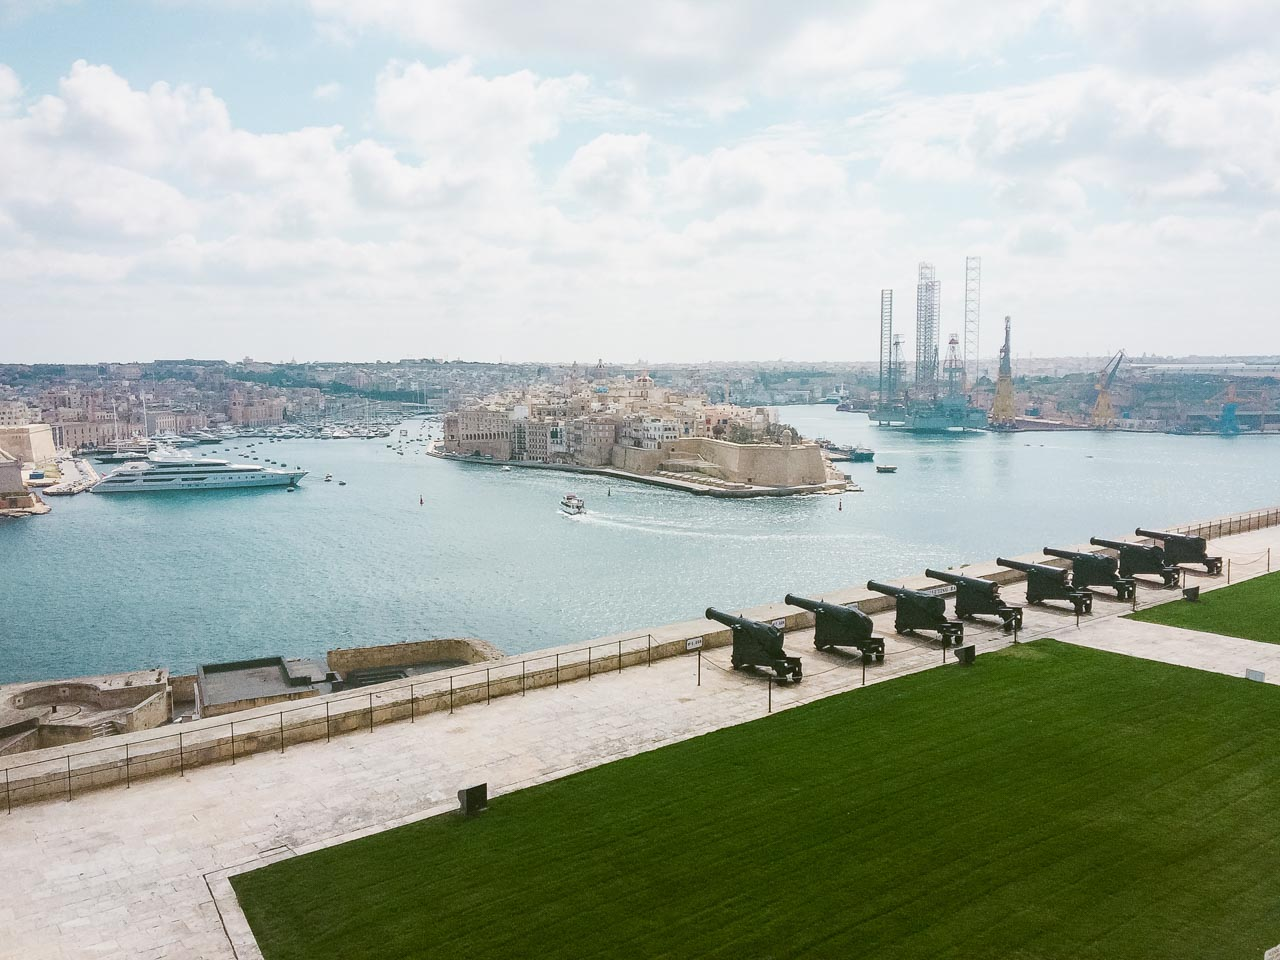 The view of the saluting battery from Upper Barrakka Gardens in Valletta, Malta